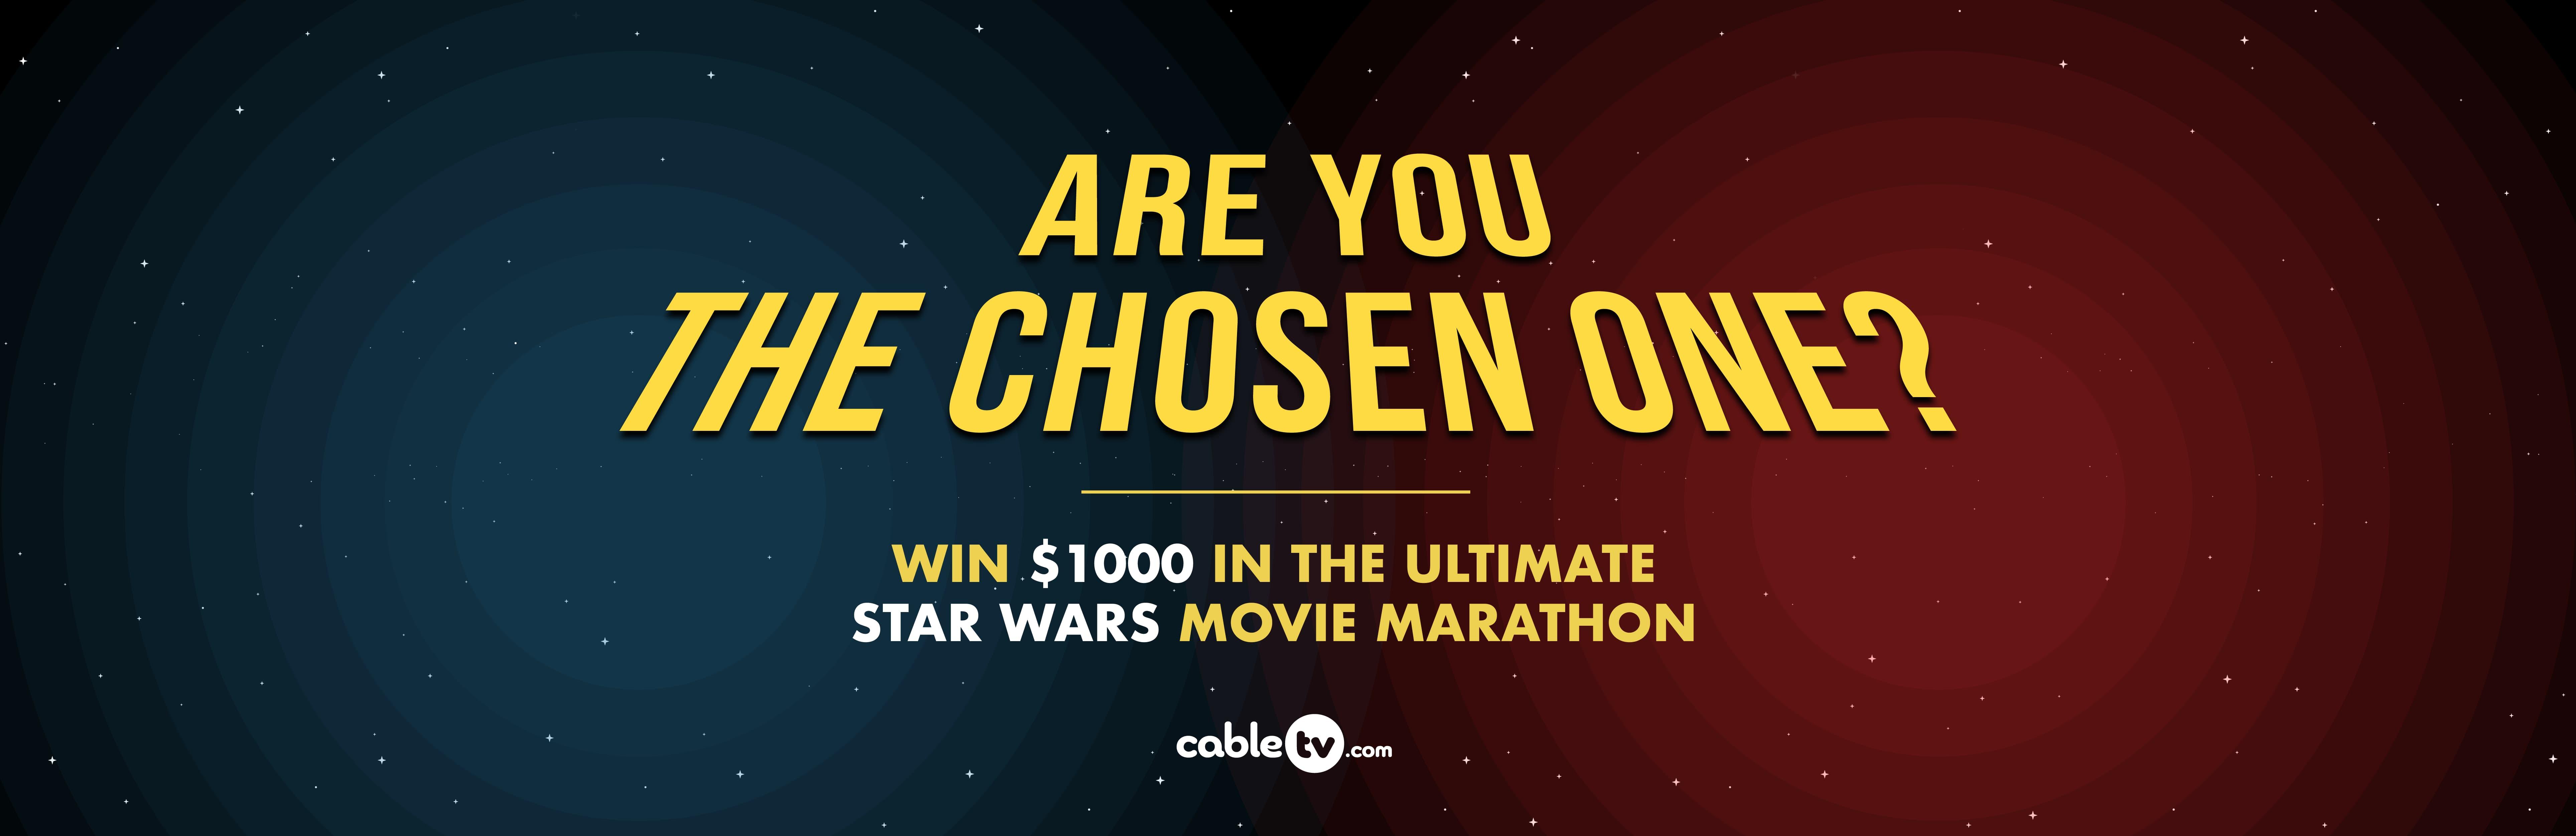 Star Wars Movie Marathon | CableTV.com